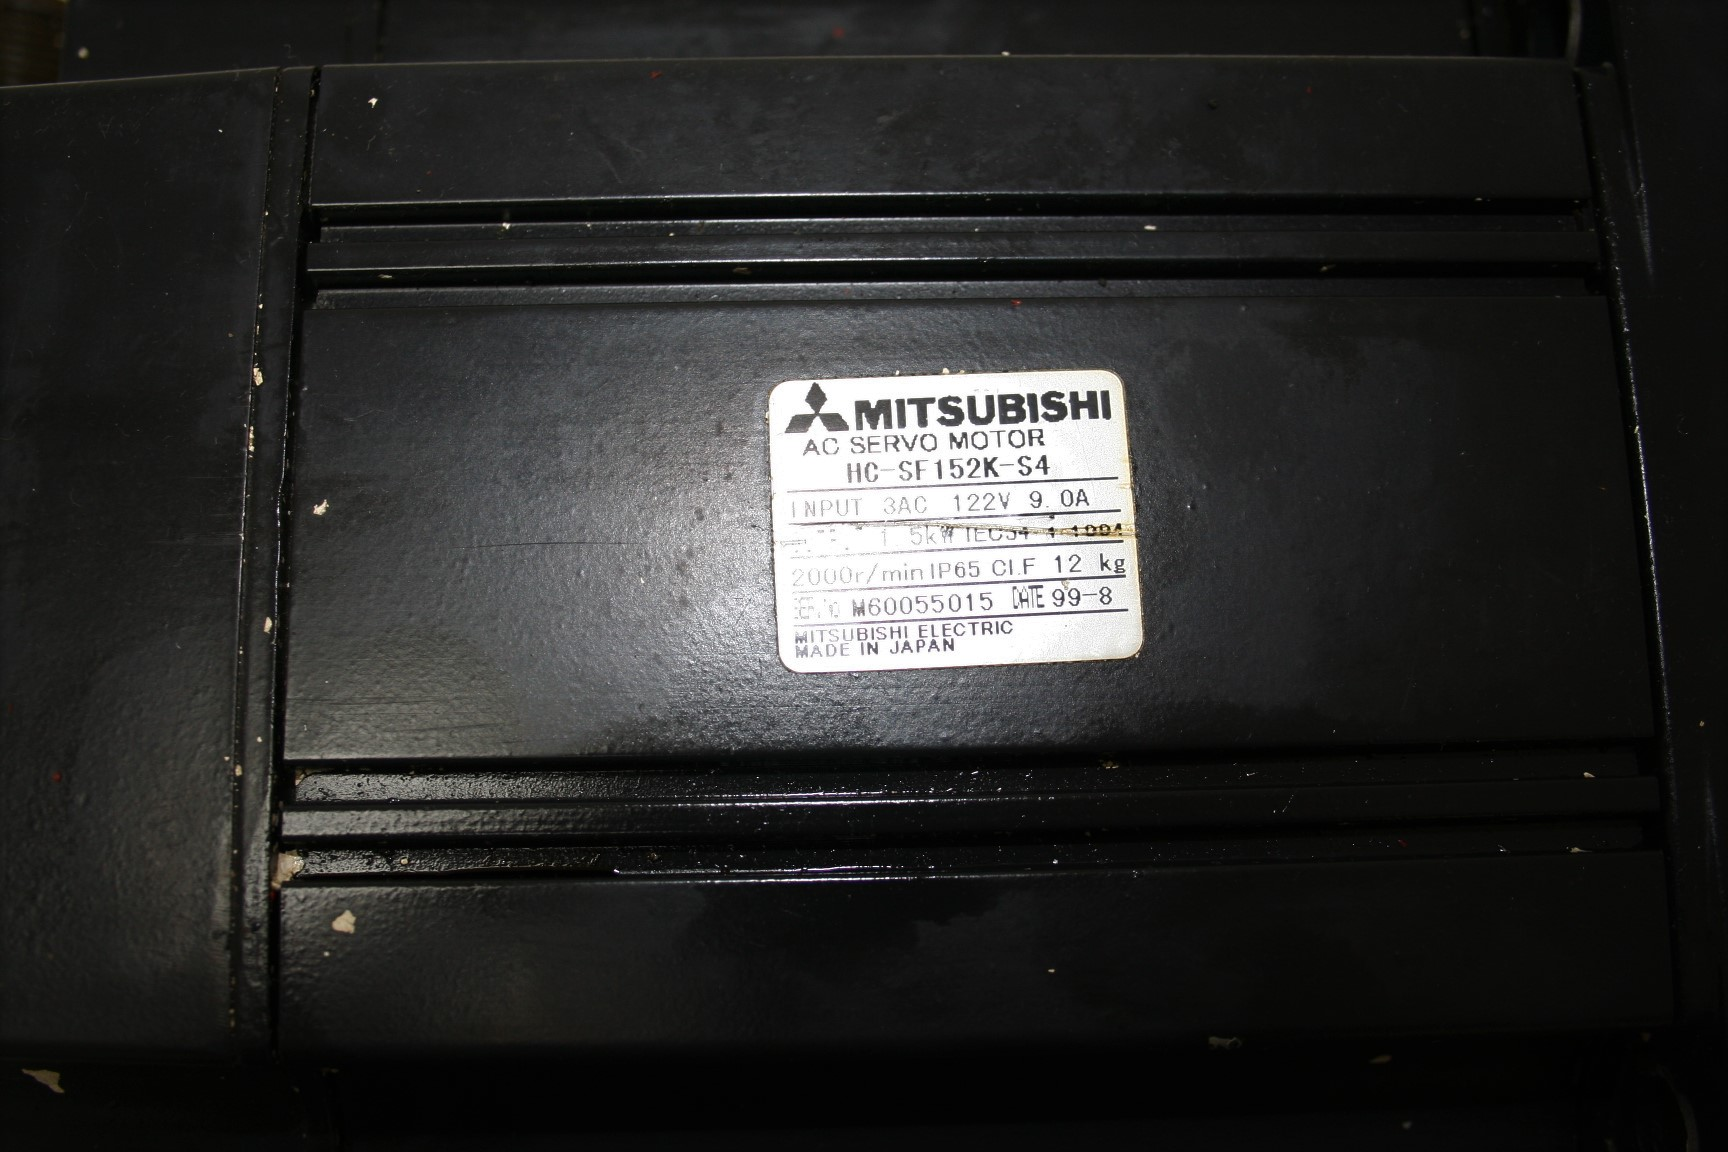 Mazak Mitsubishi AC Servo Motor HC-SF152K-S4 e